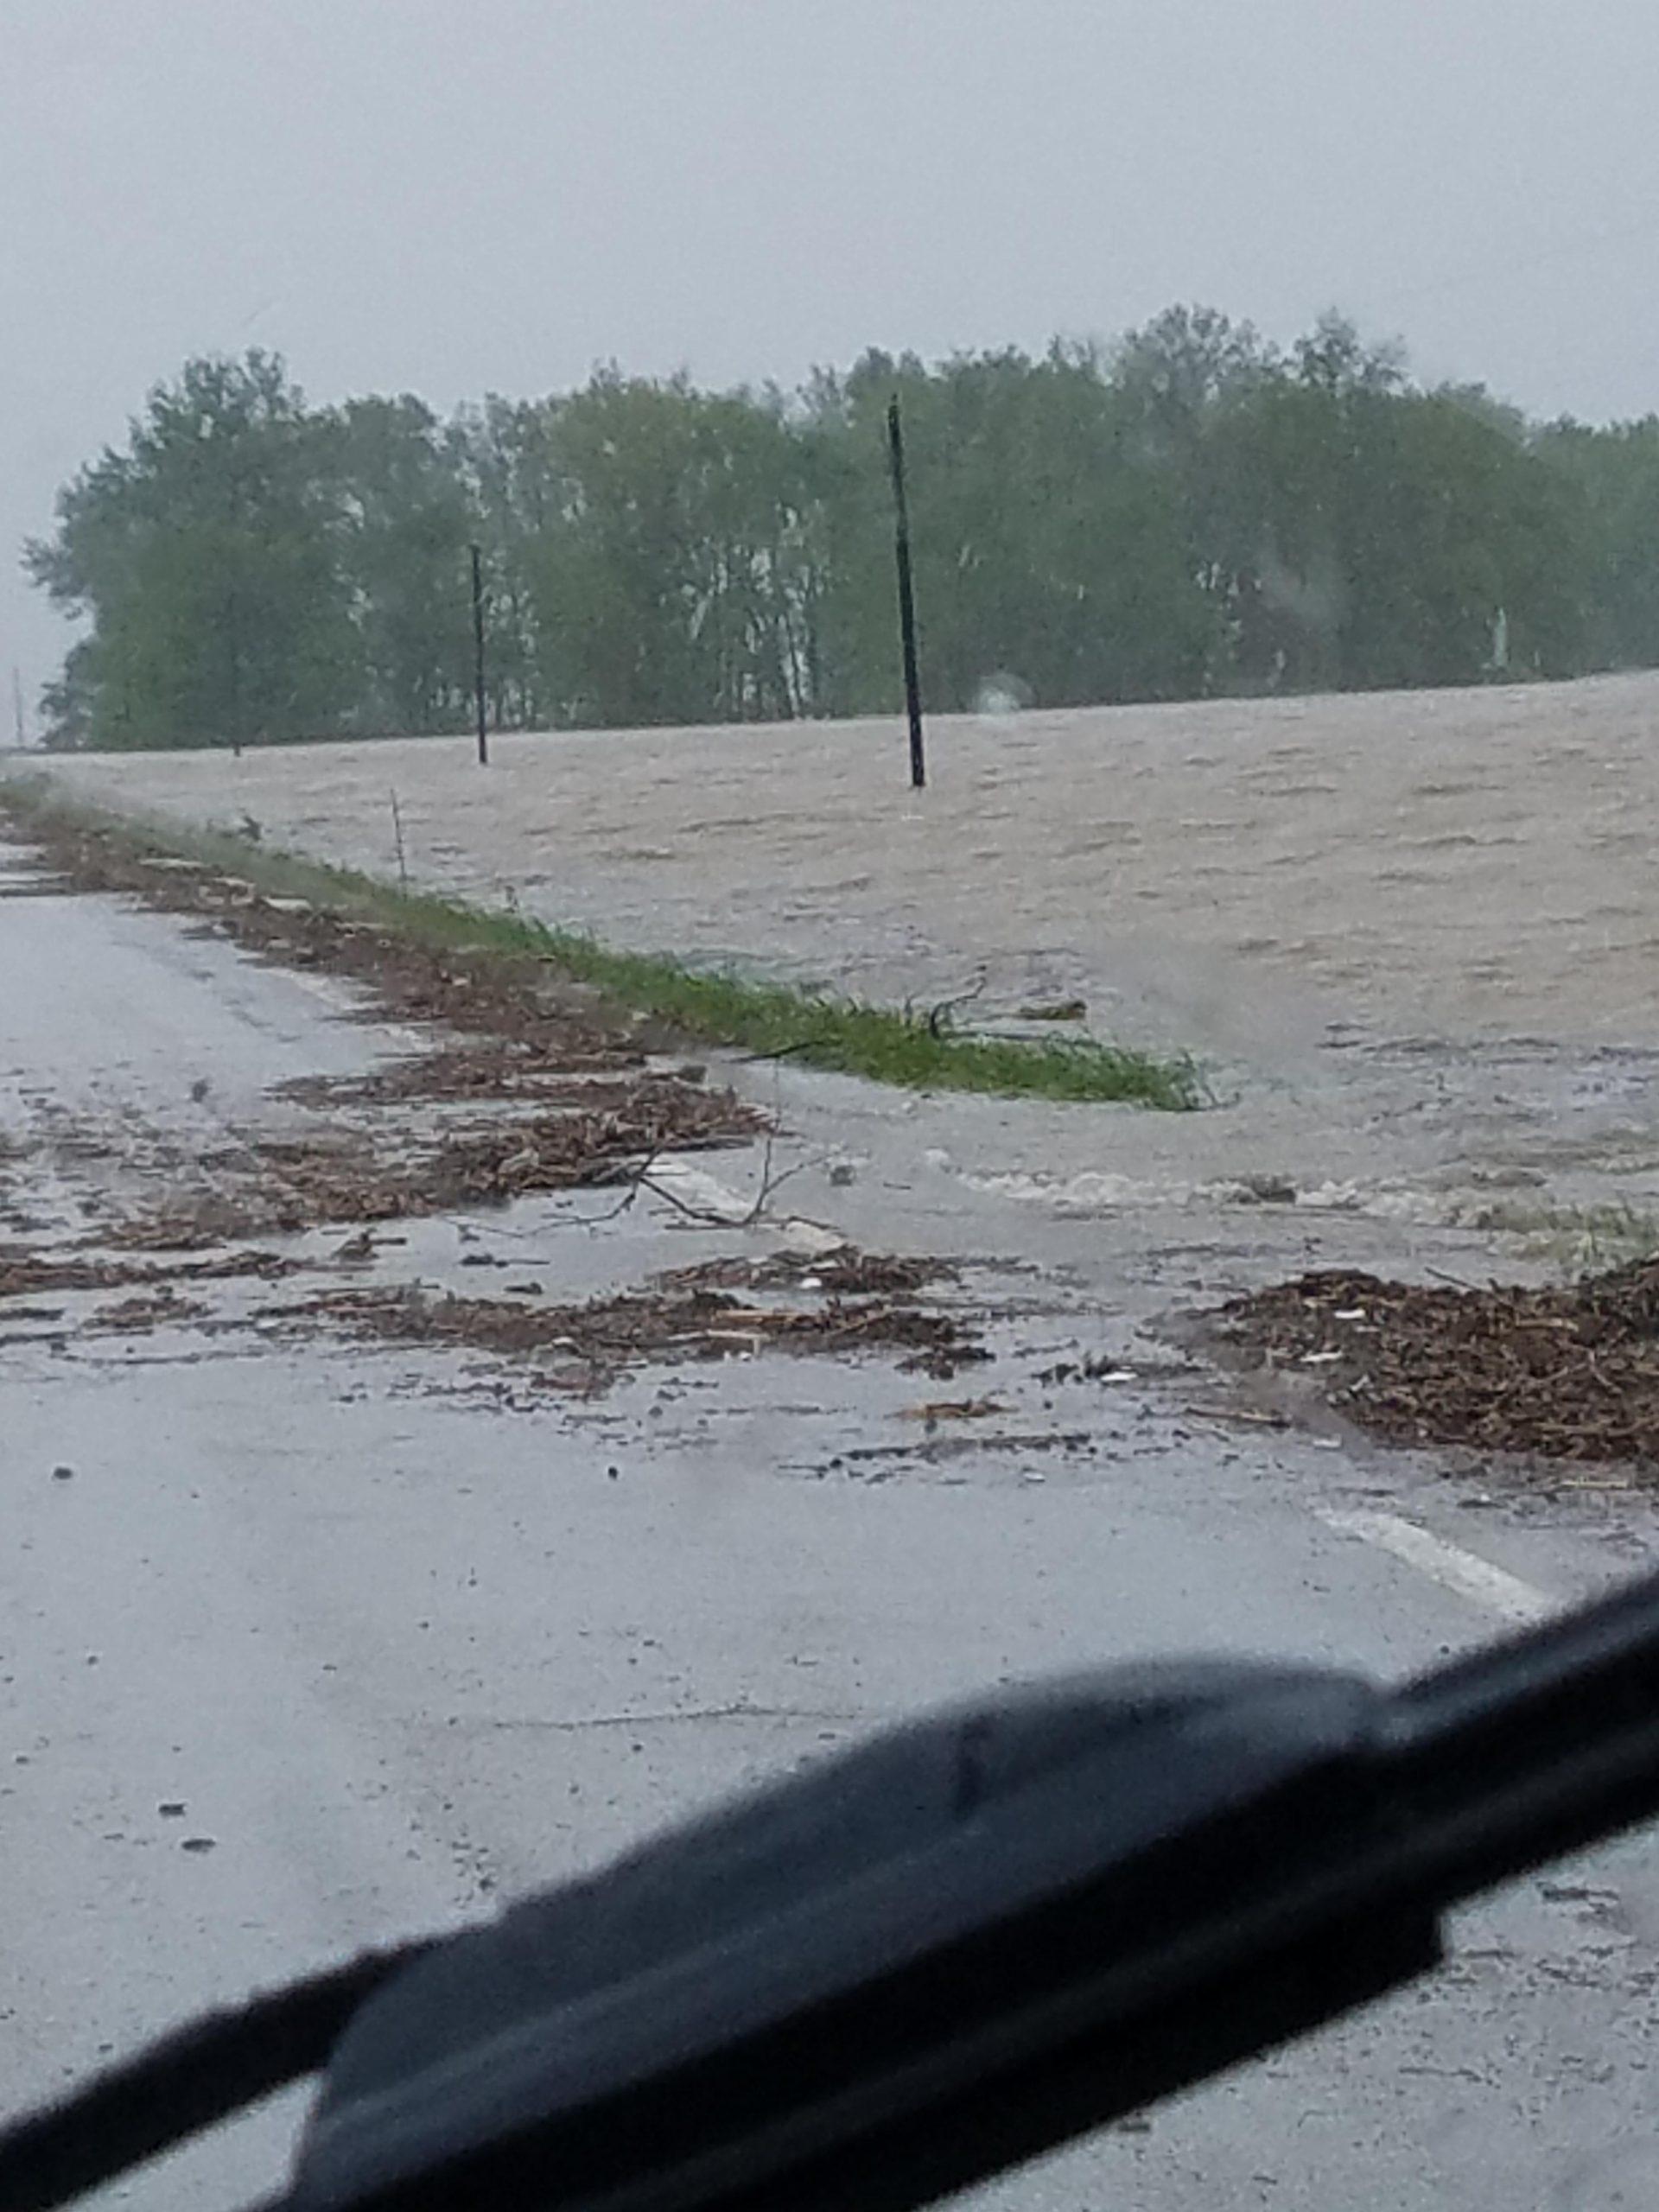 Flood Warning on the Kaskaskia River in Vandalia--updated forecast levels